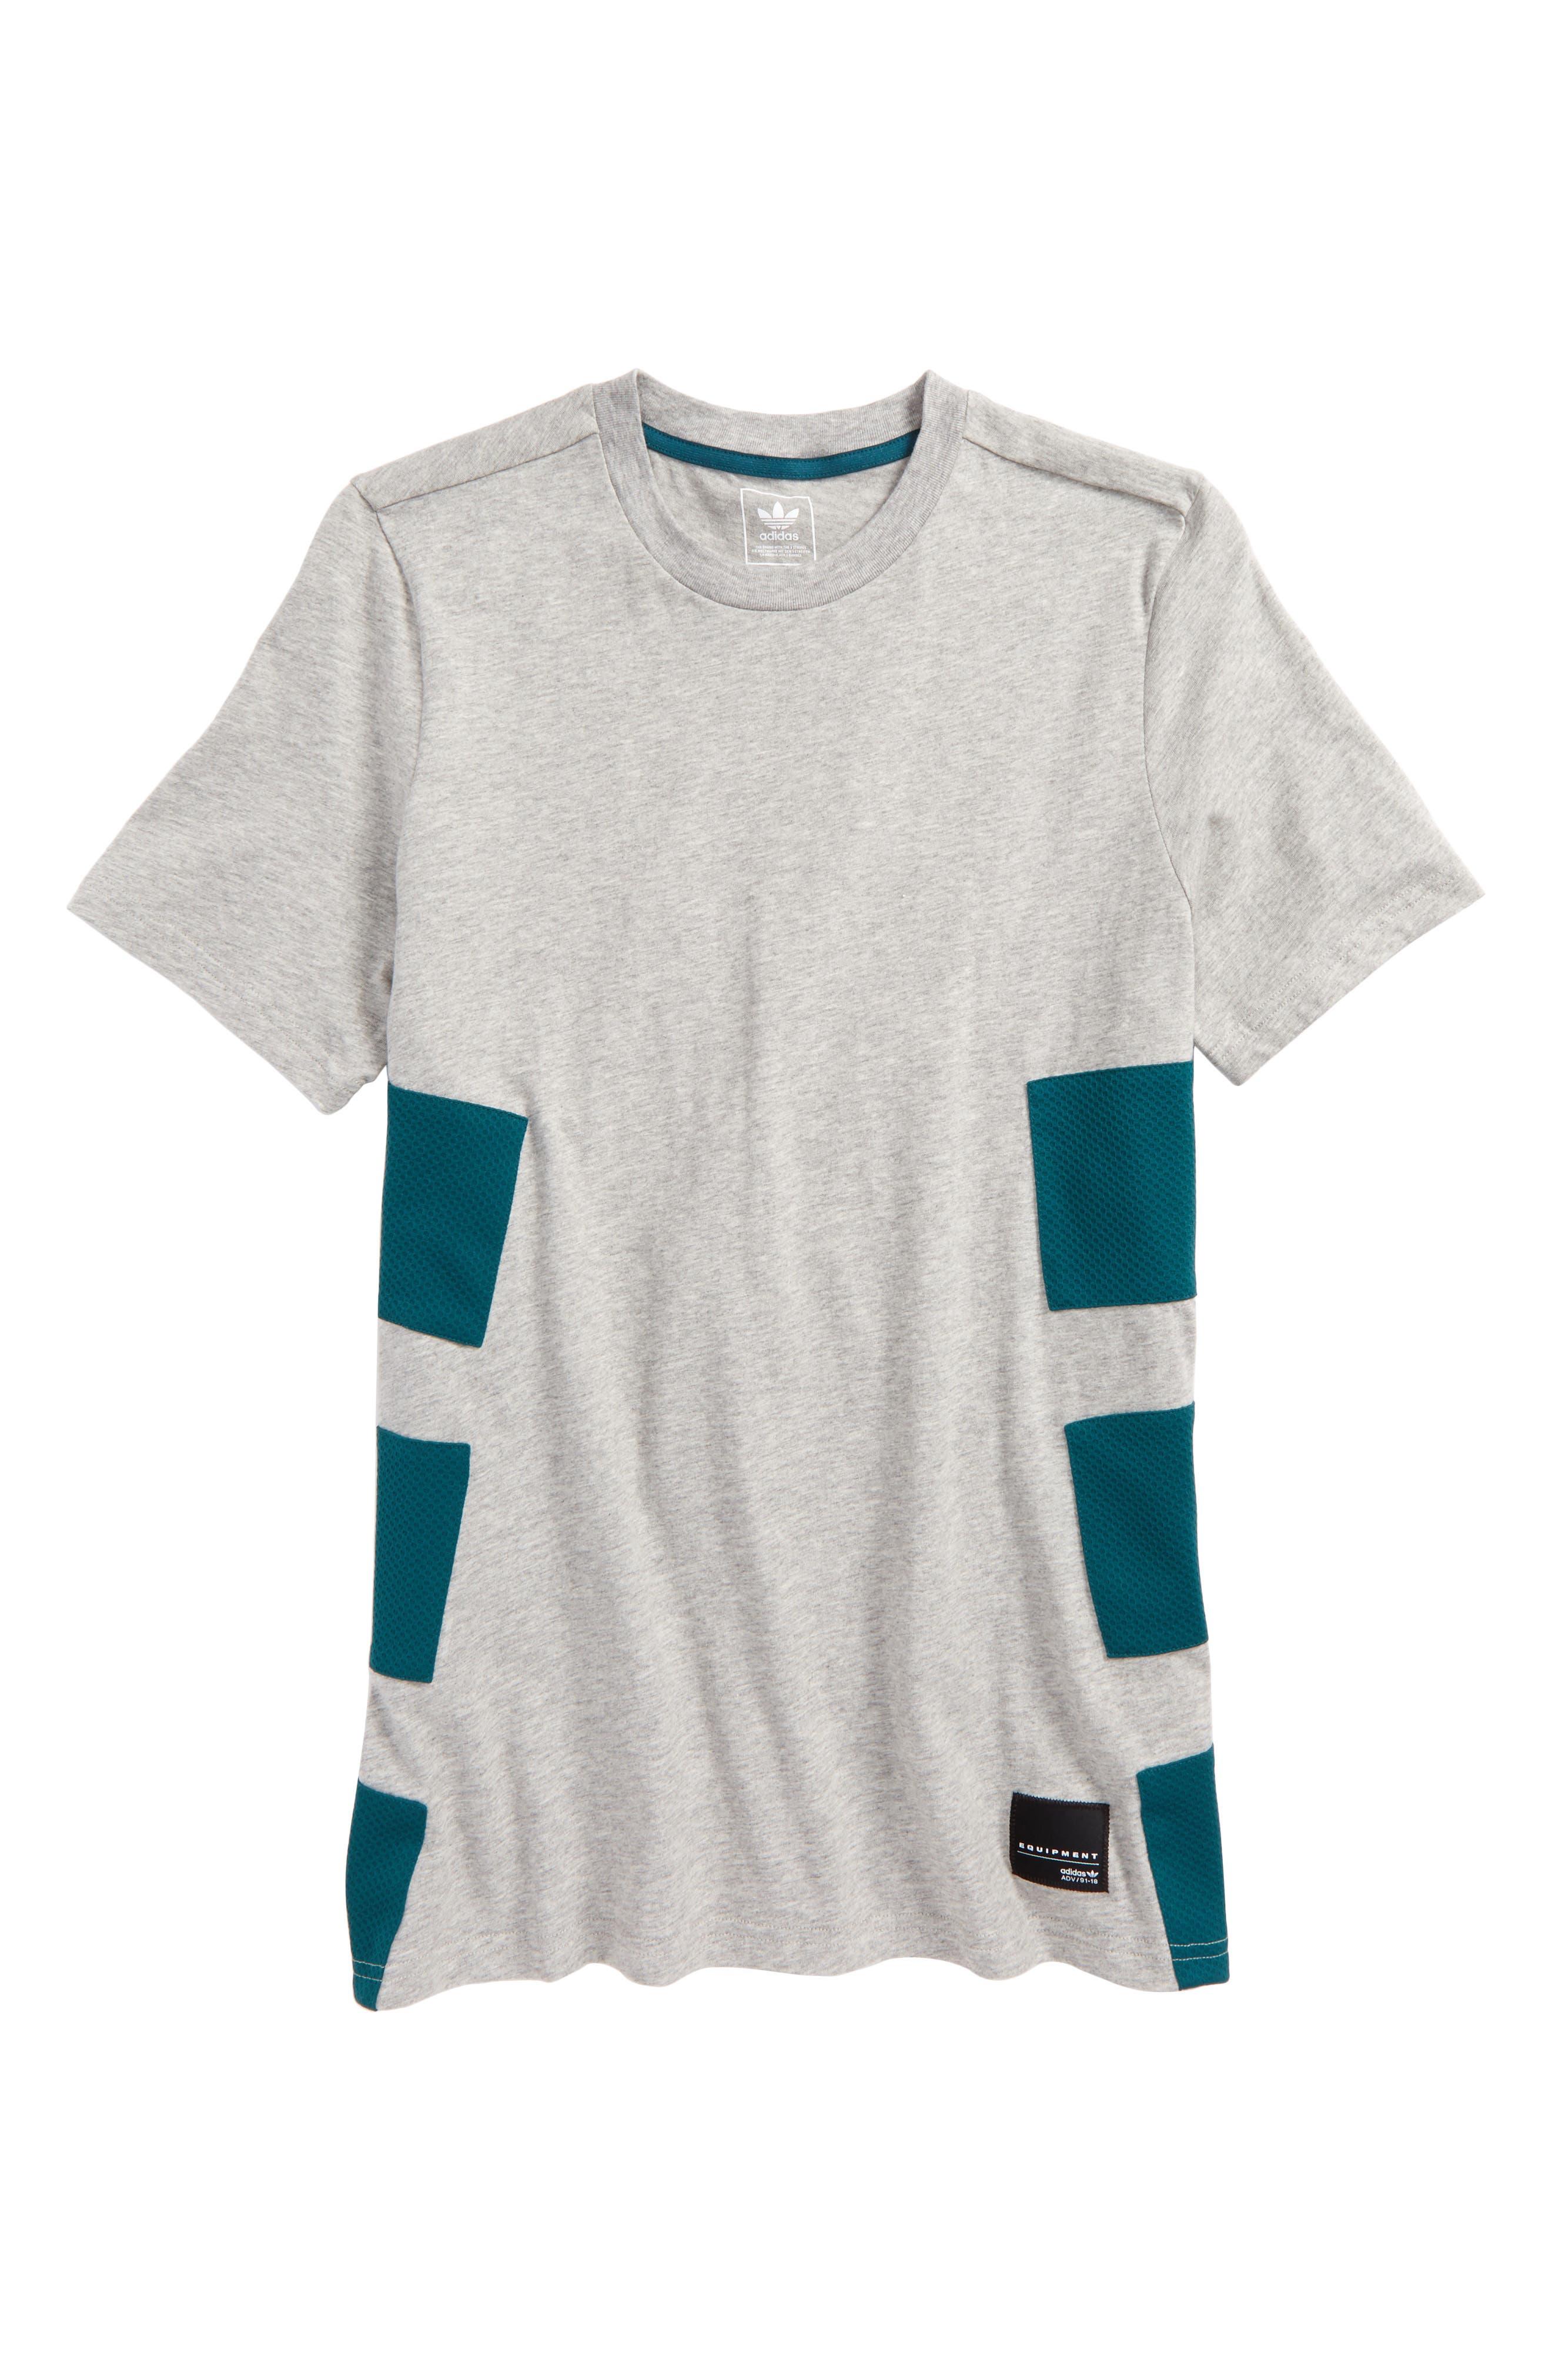 EQT T-Shirt,                             Main thumbnail 1, color,                             035